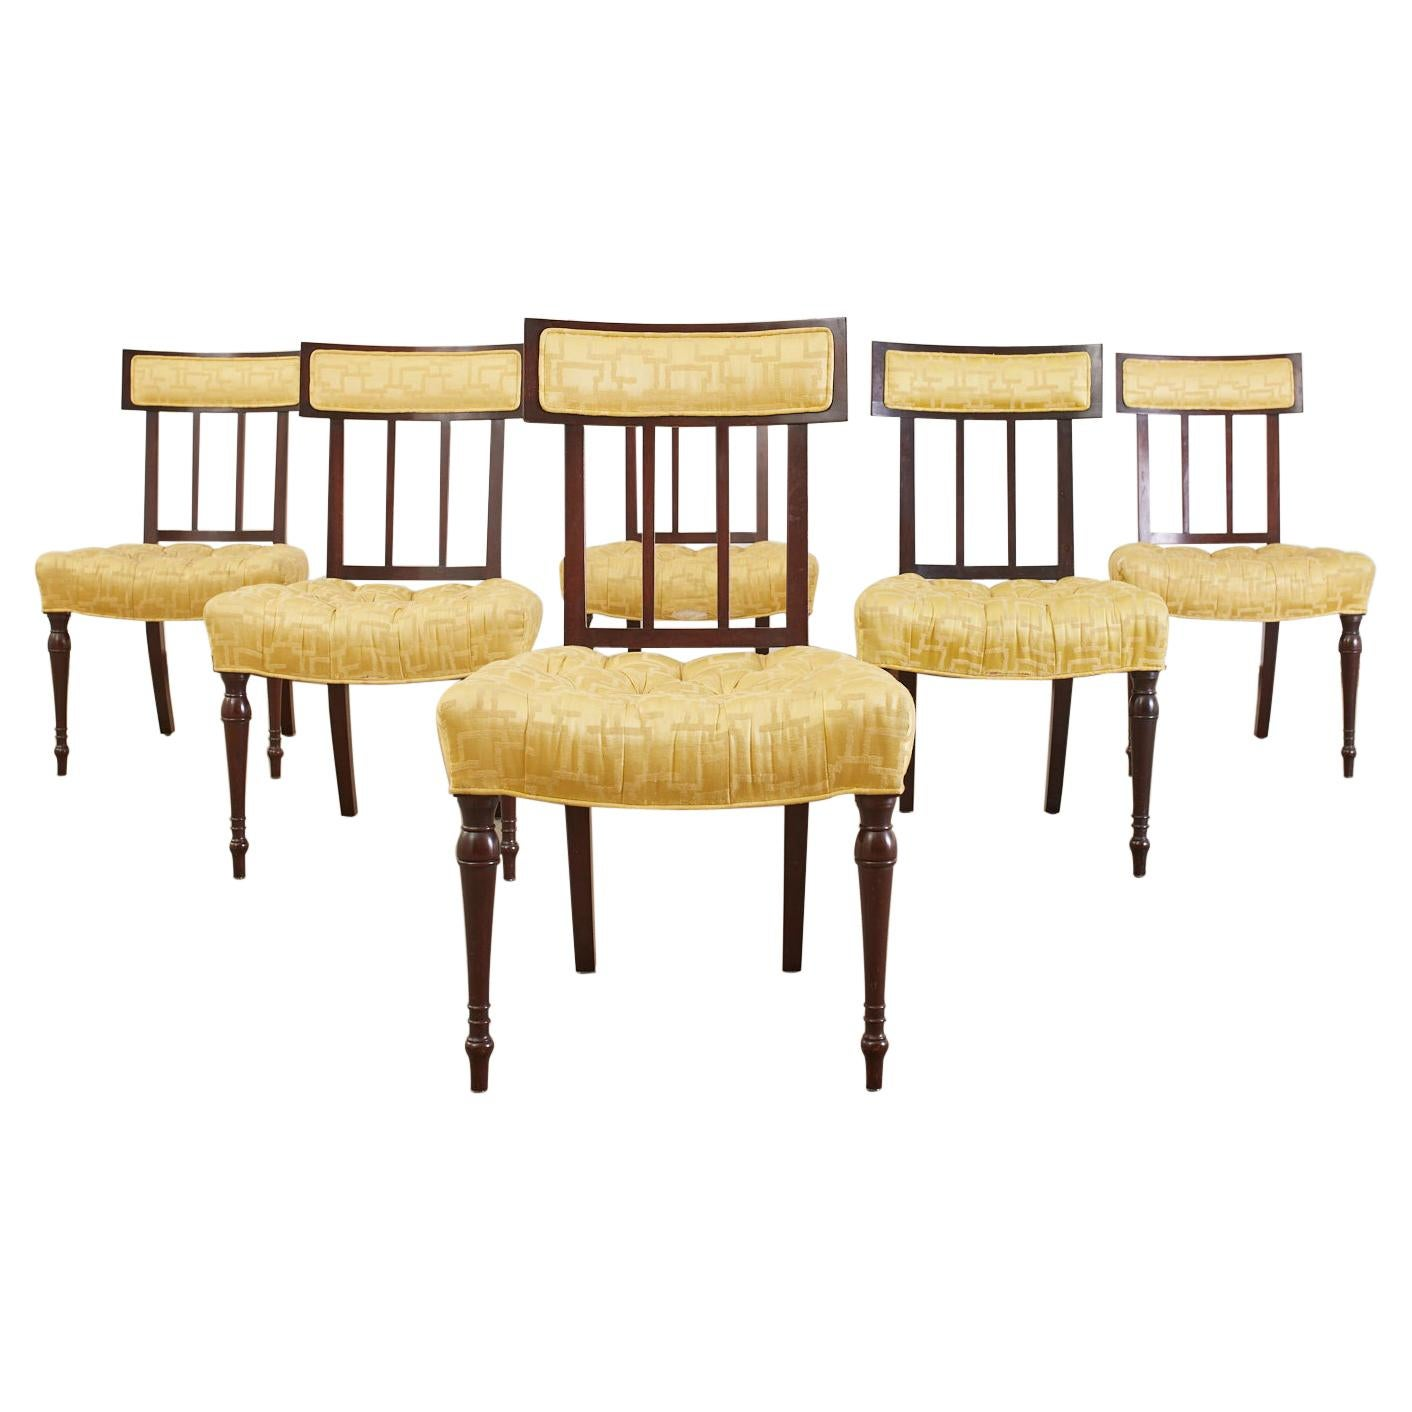 Set of Six English Regency Mahogany Tufted Dining Chairs